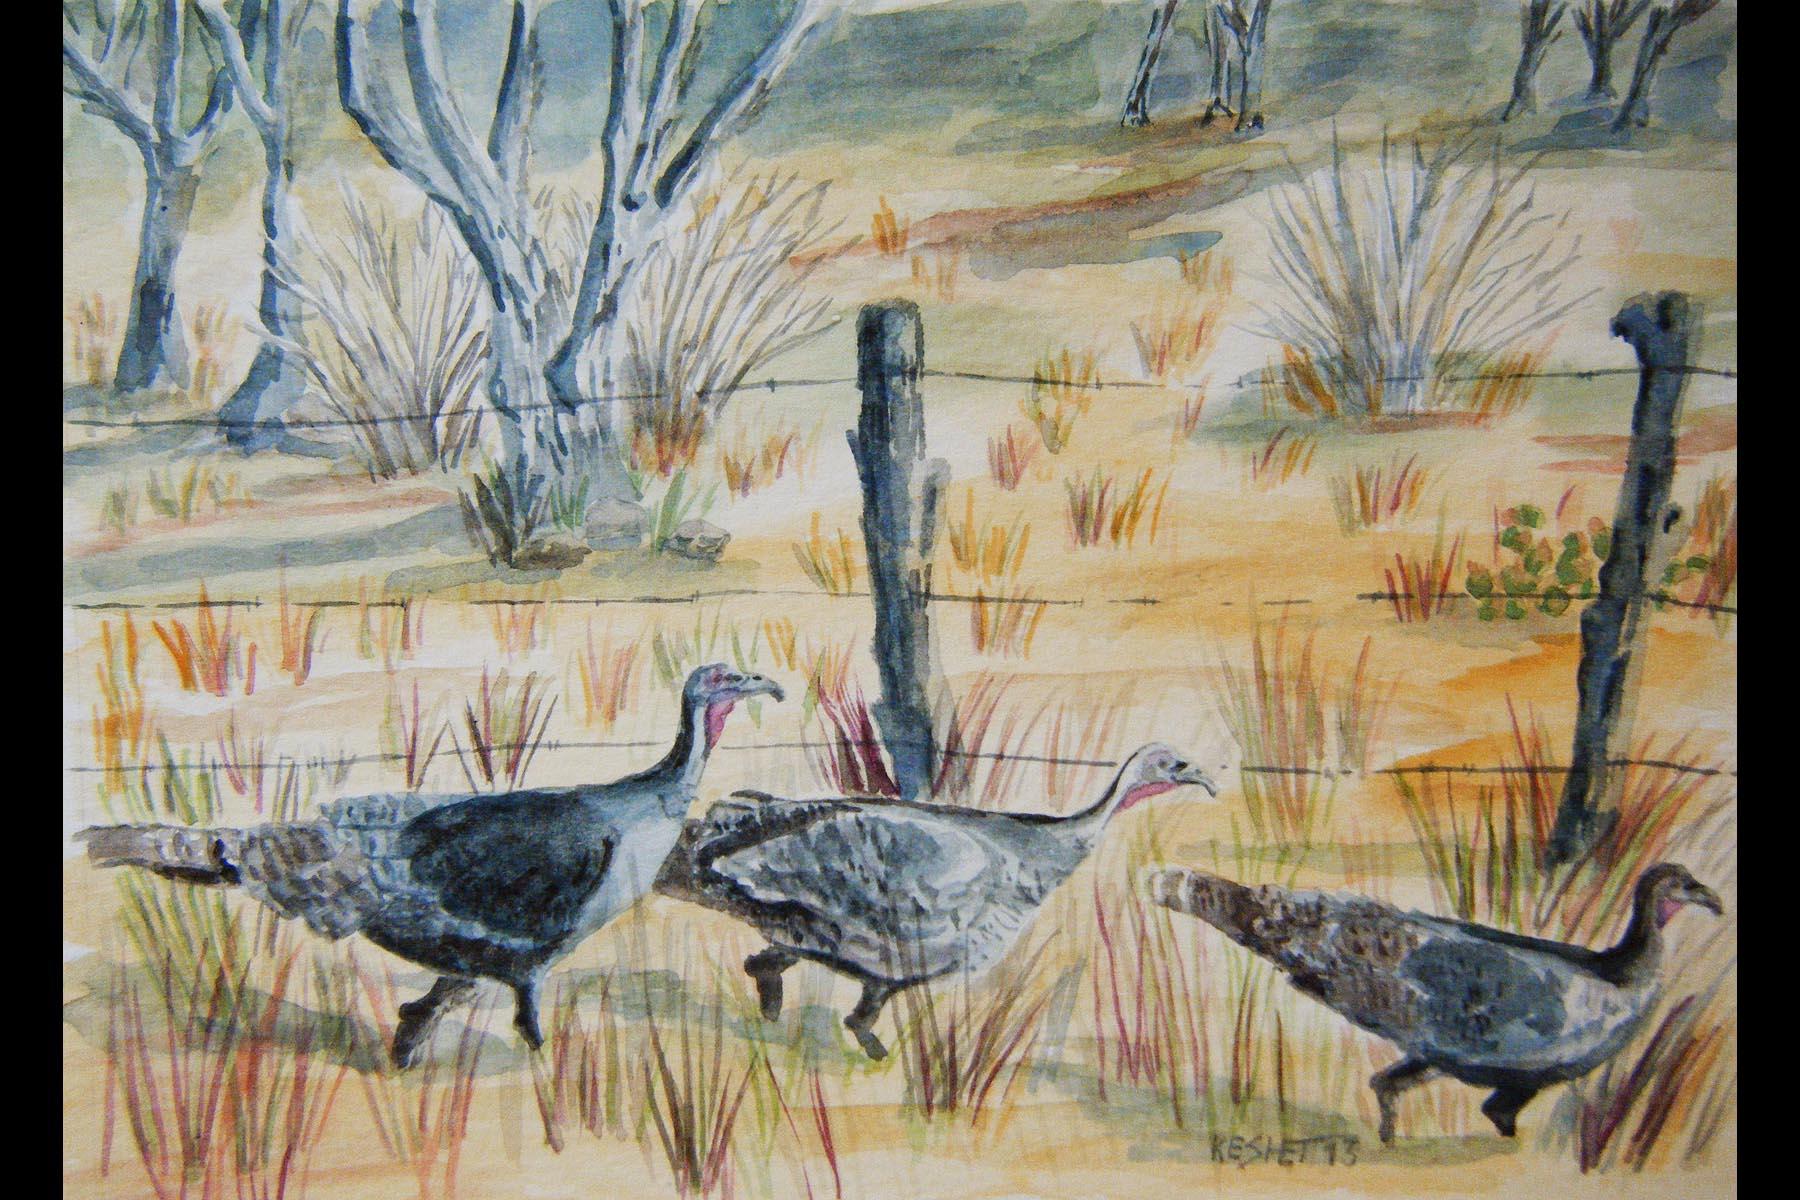 Cedar_Keshet_AlongsideTheRoad_Watercolor_9x12_$150.jpg